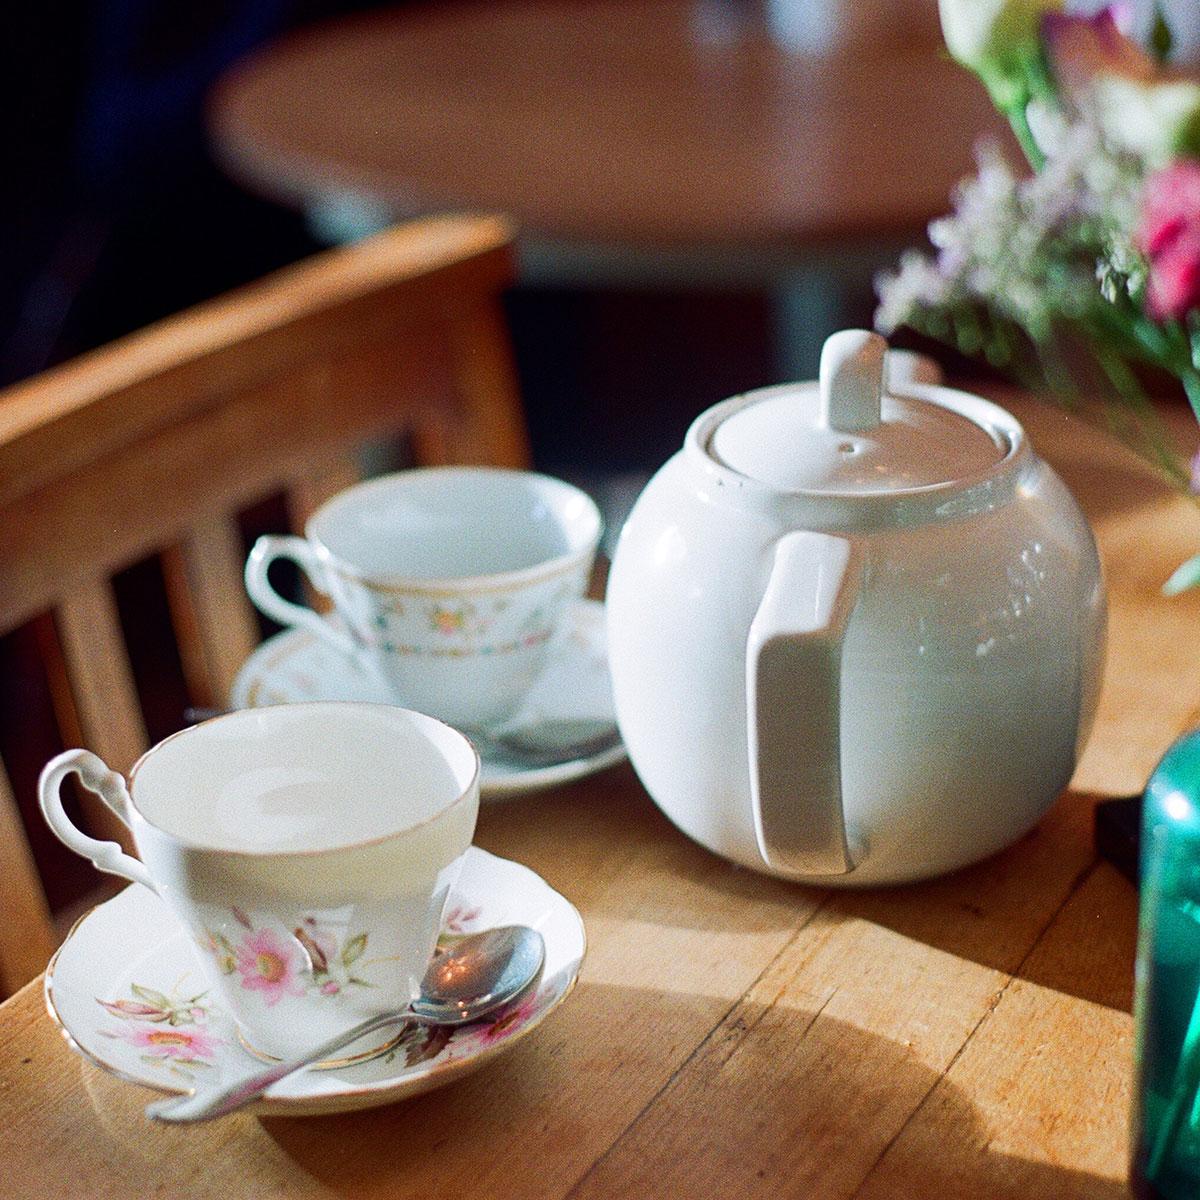 English Breakfast Tea: Über die berühmte Früstücks-Teemischung aus New York